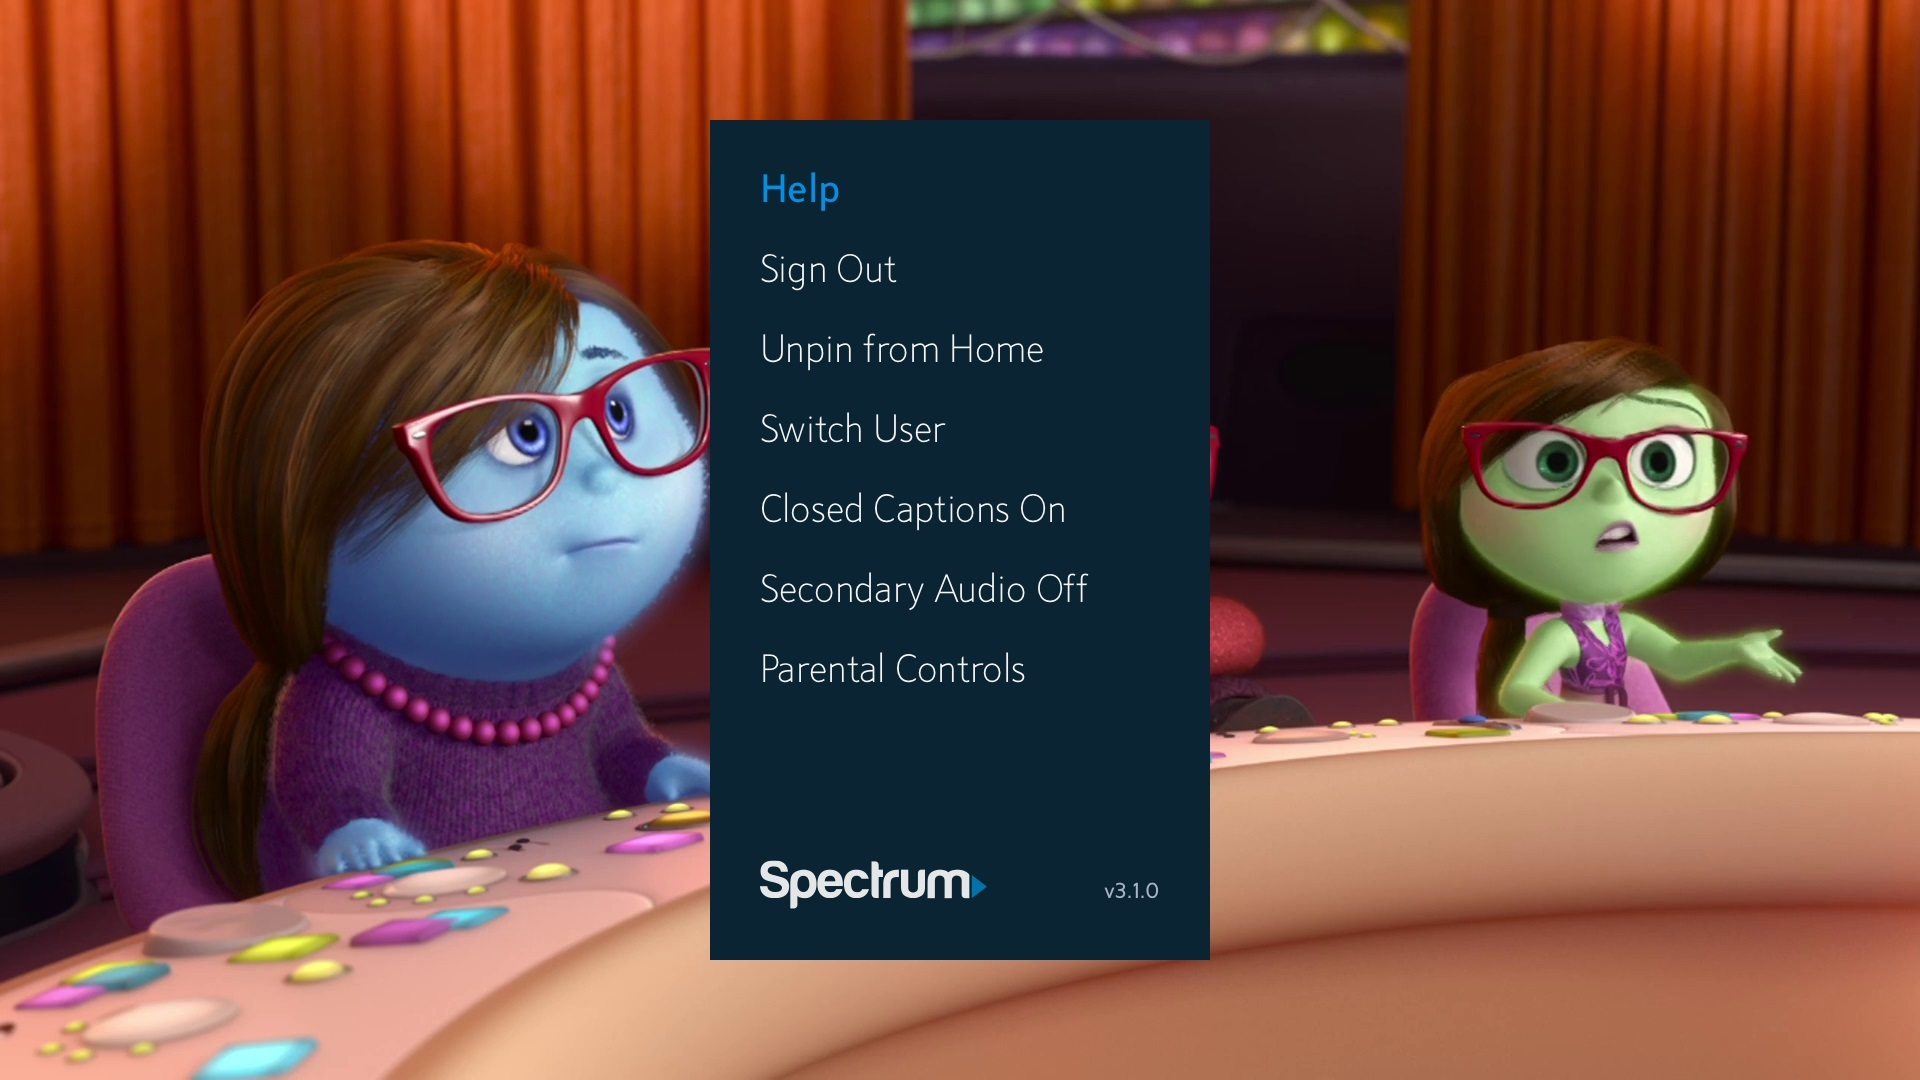 Xbox Spectrum TV app settings menu